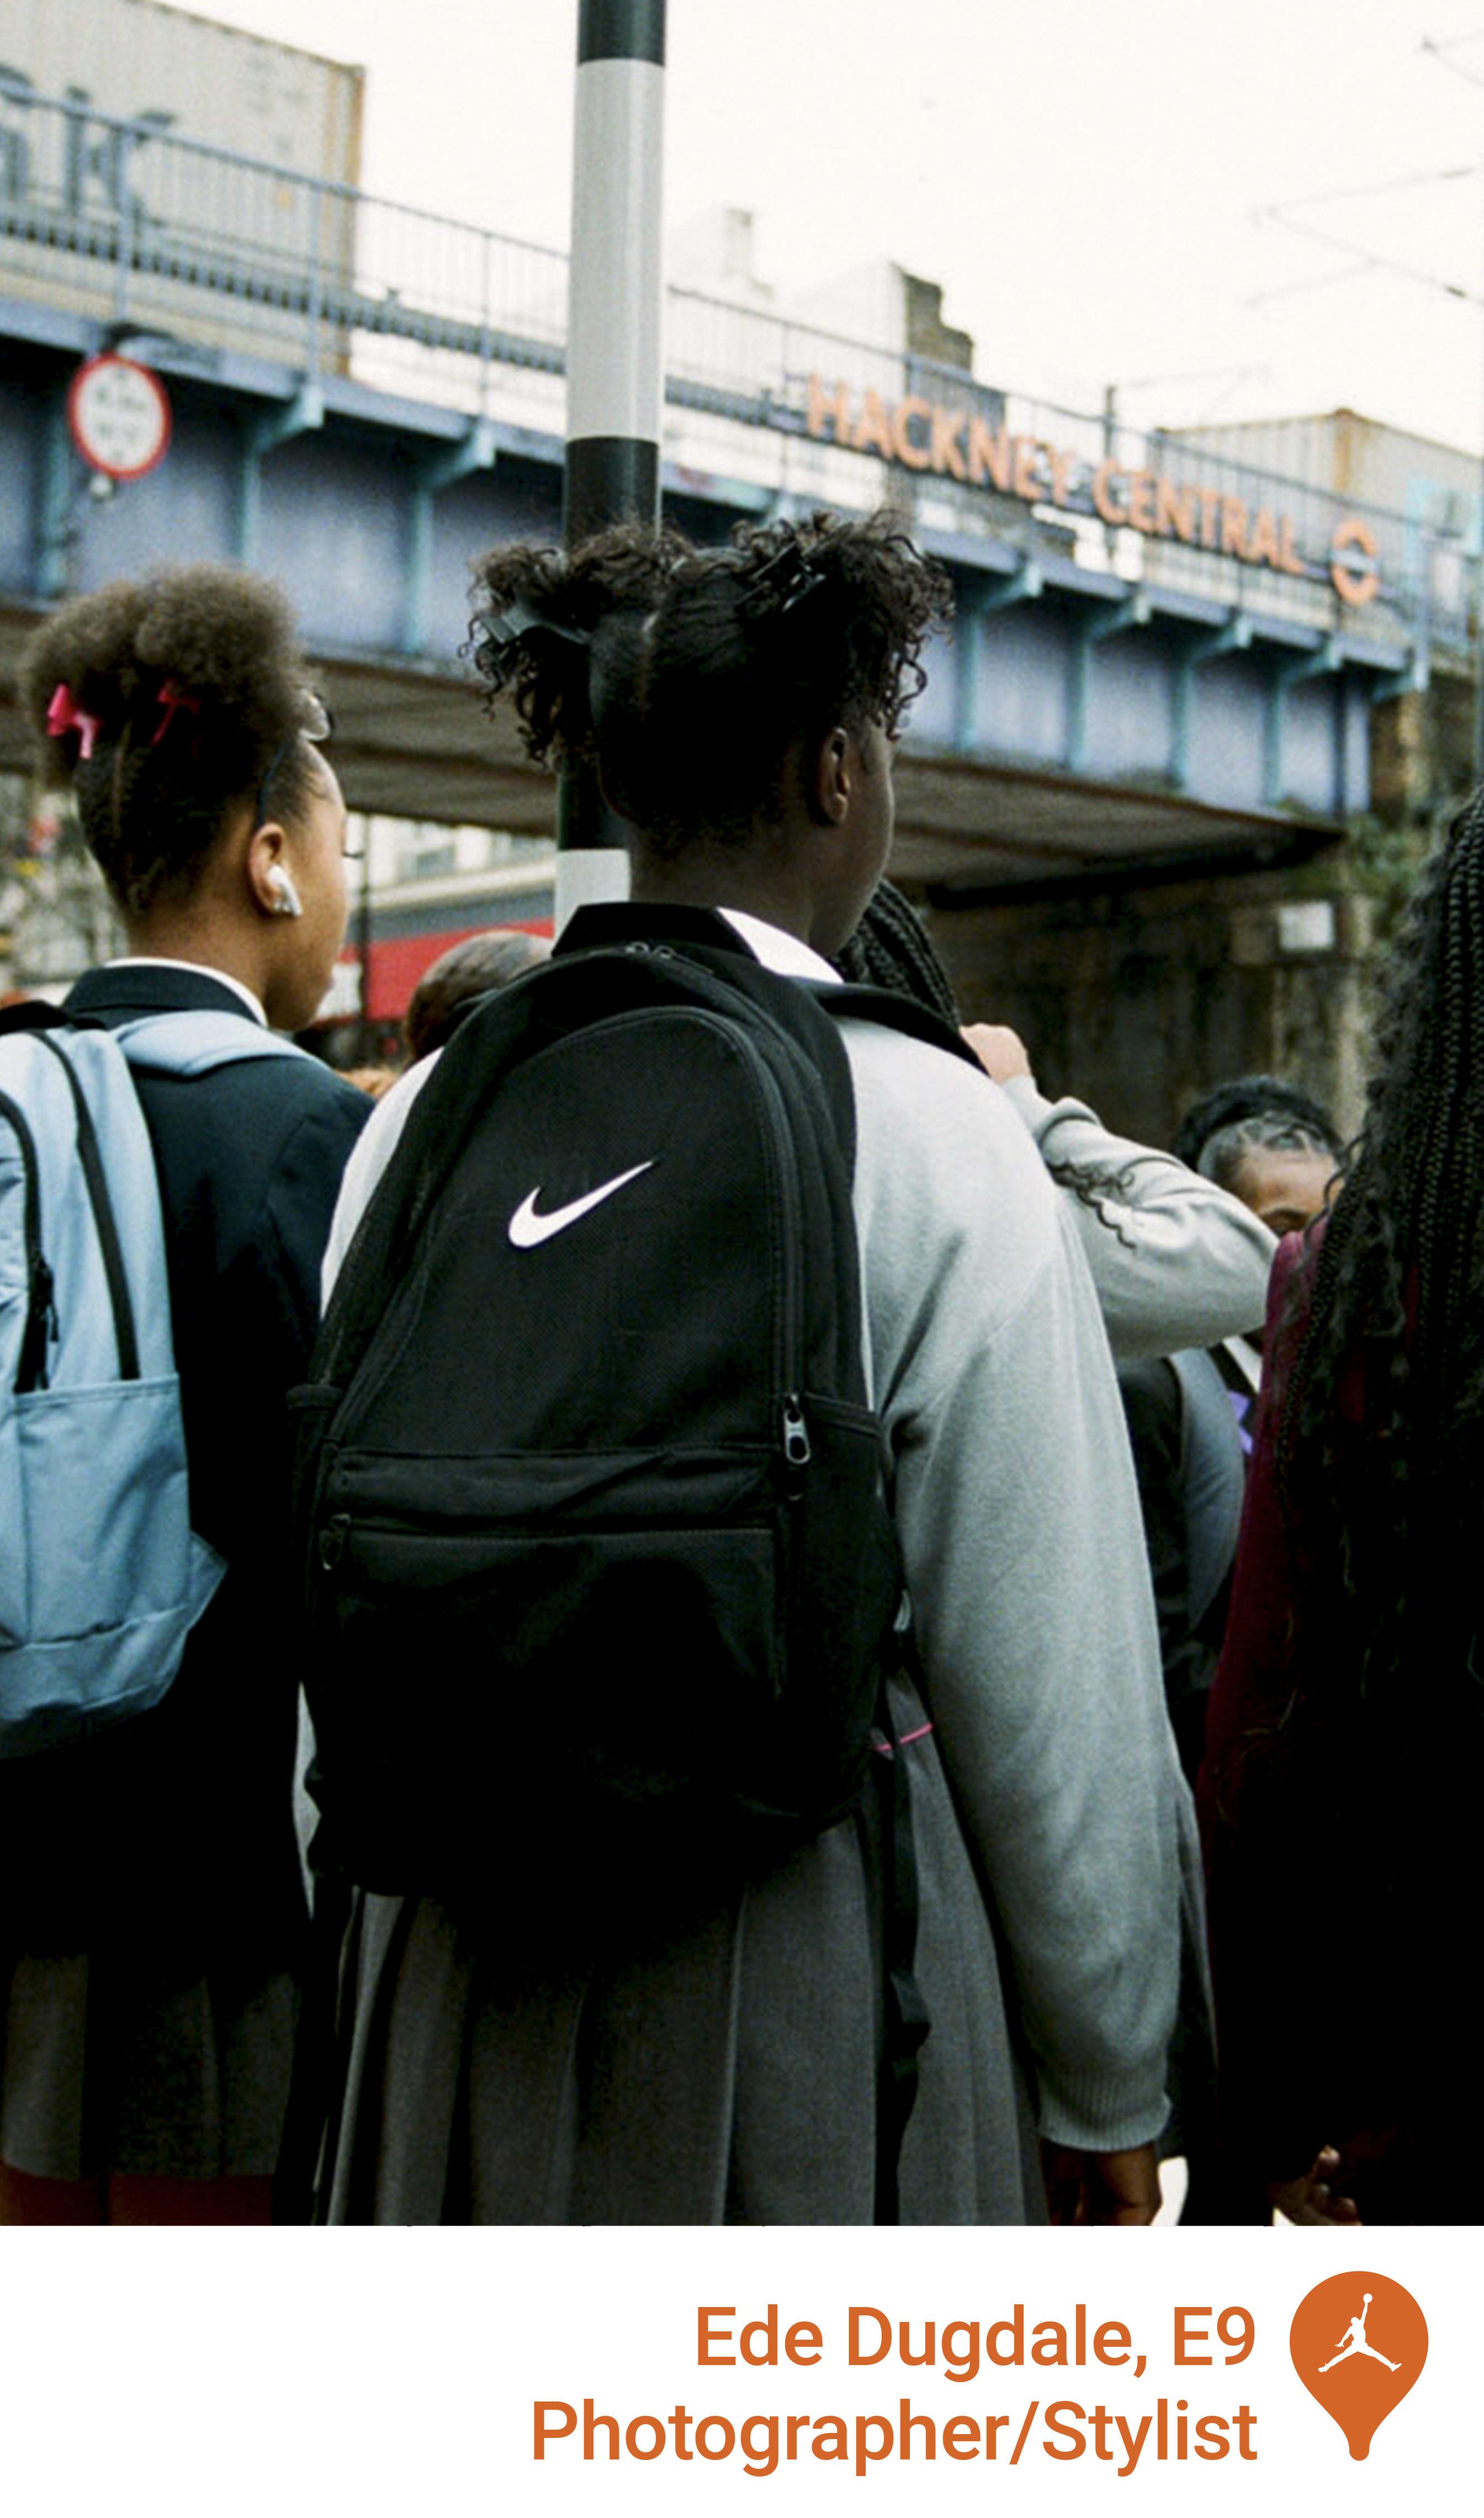 Air Jordan One: A Love Letter to London - Ede Dugdale London Schoolgirls